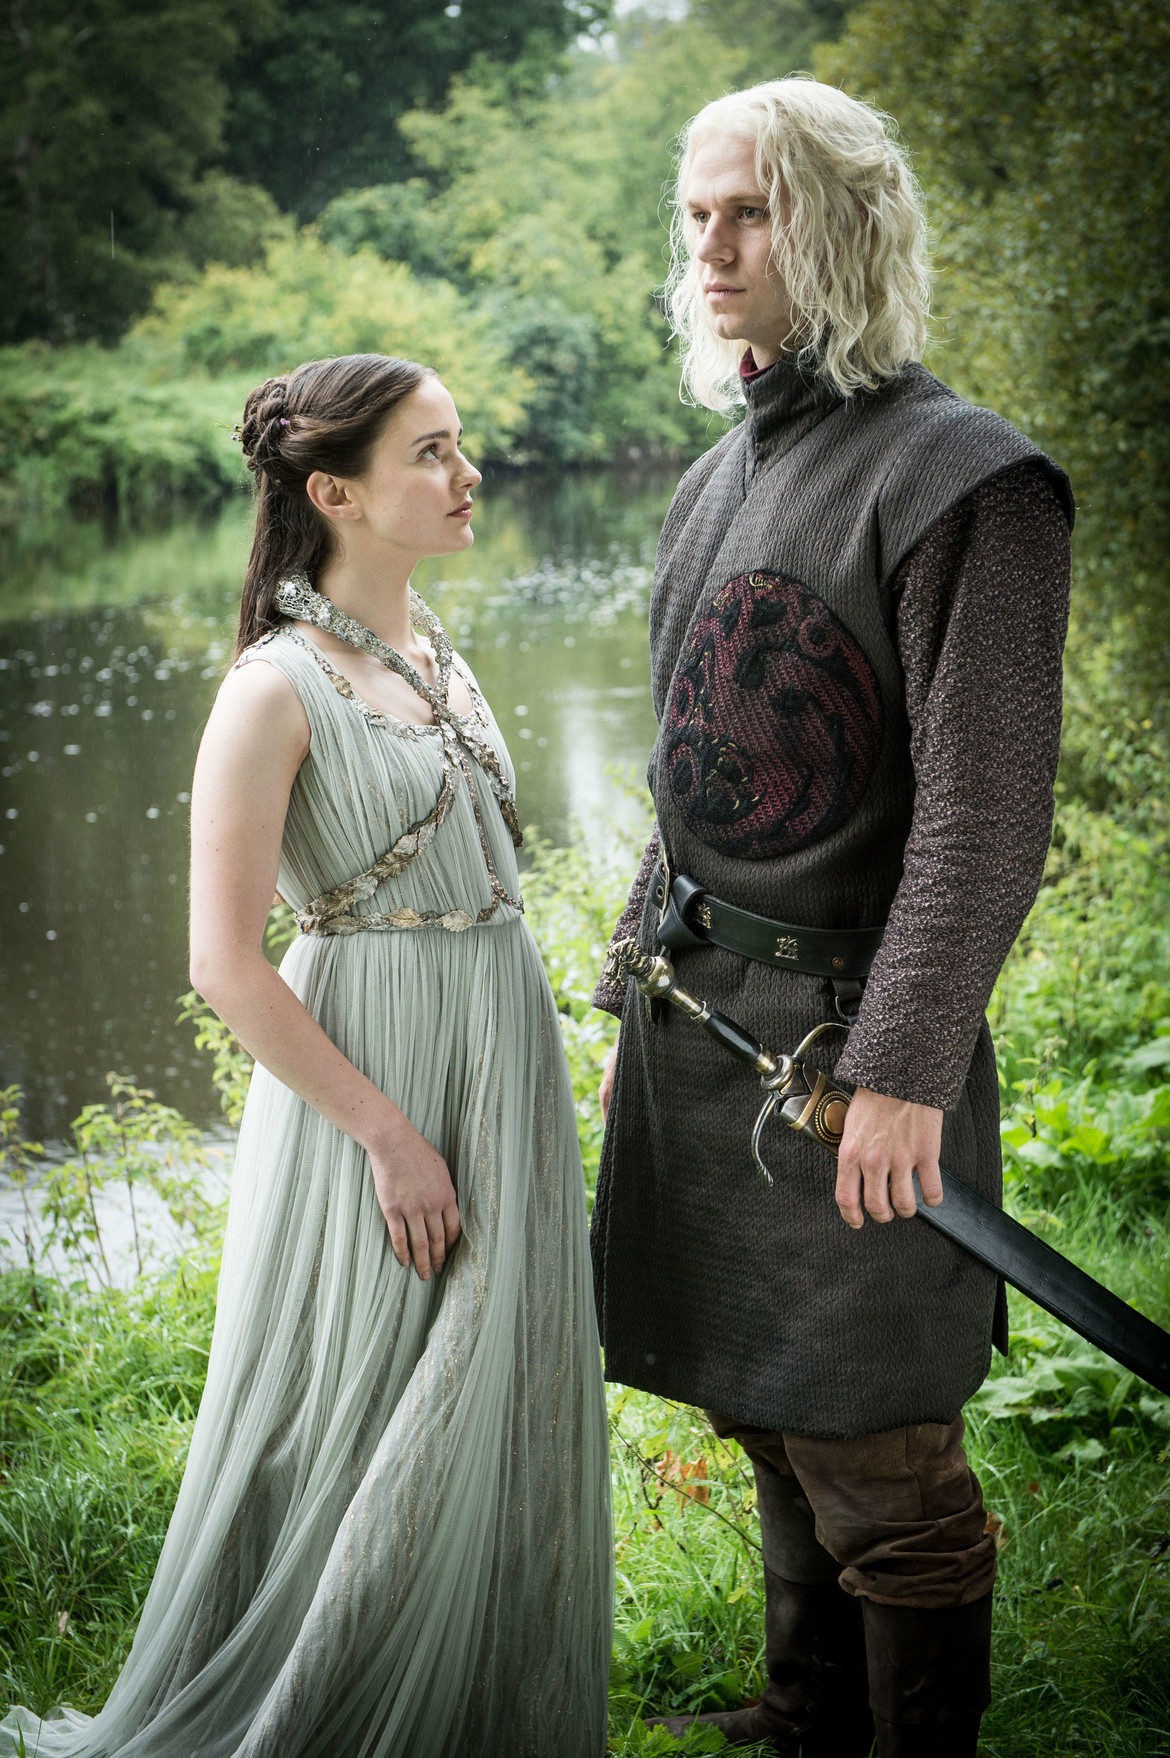 Game of Thrones season 7 - Lyanna Stark and Rhaegar Targaryen